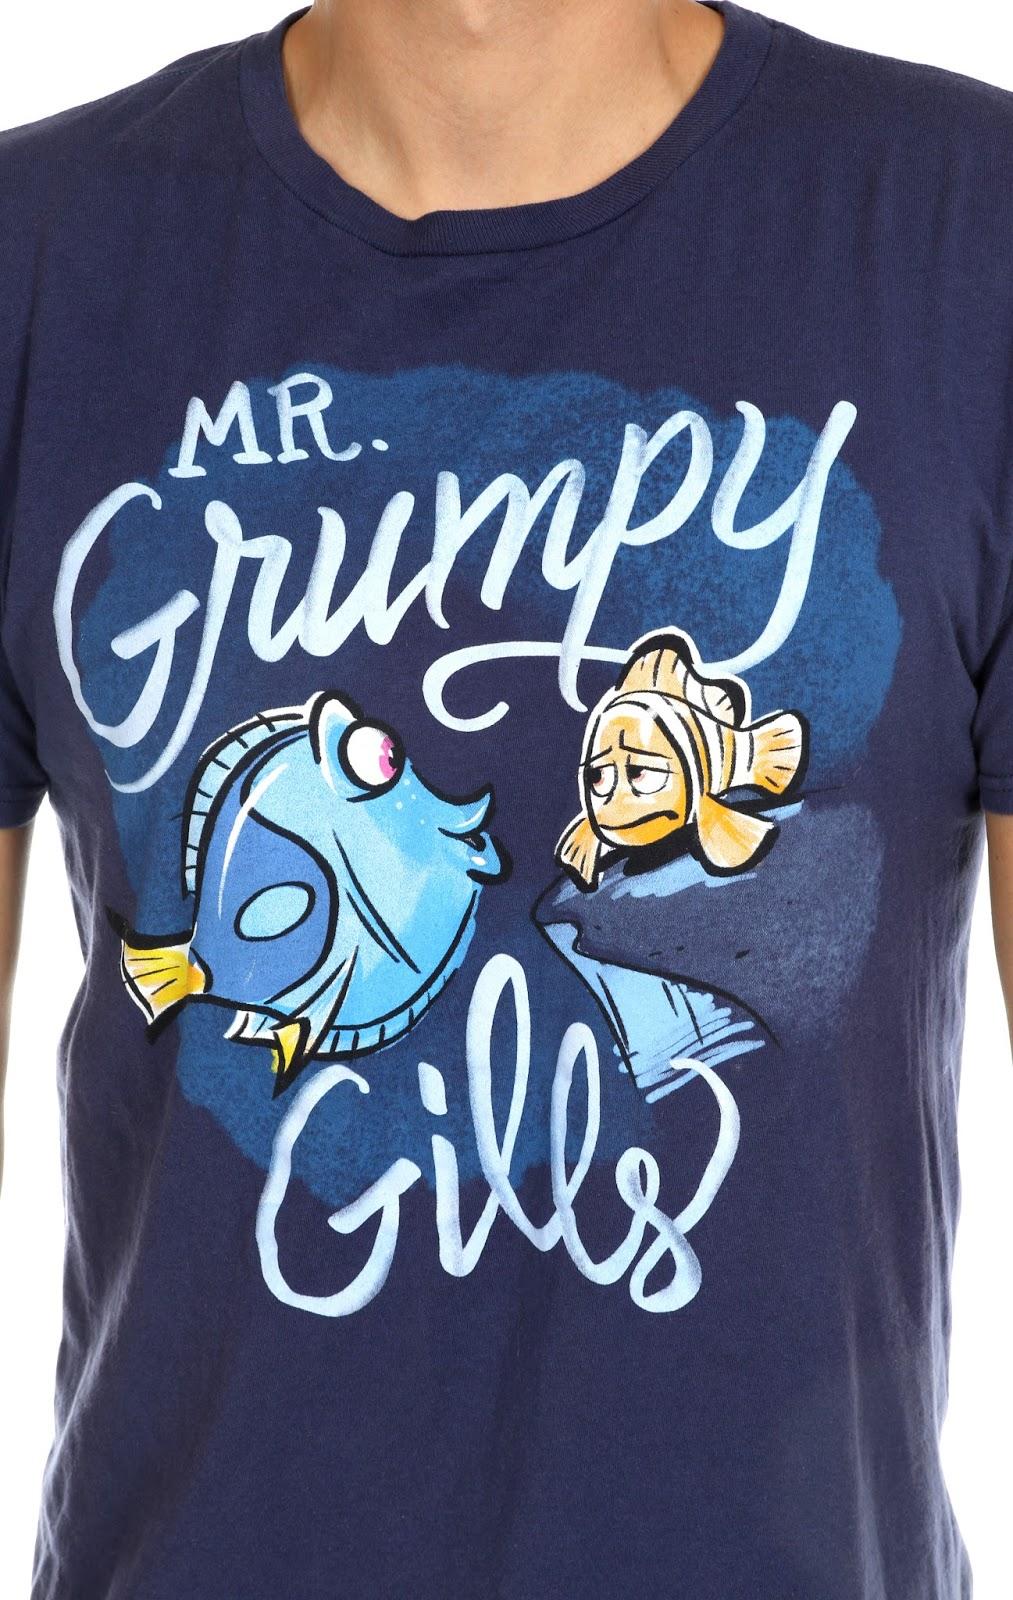 Grumpy TShirts amp Shirt Designs  Zazzle